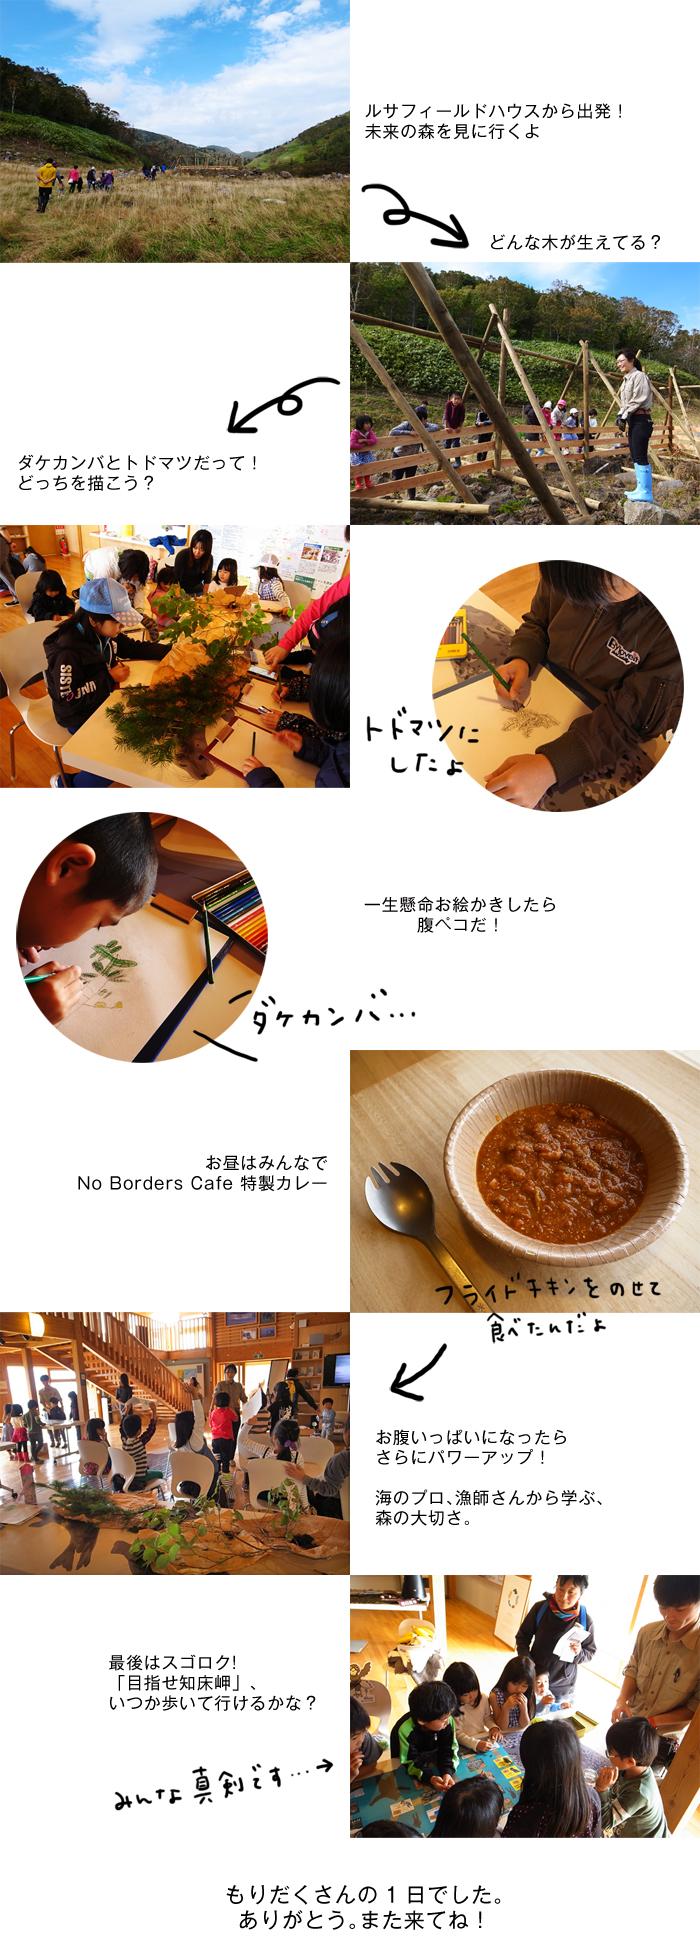 171007rusa_blog.jpg